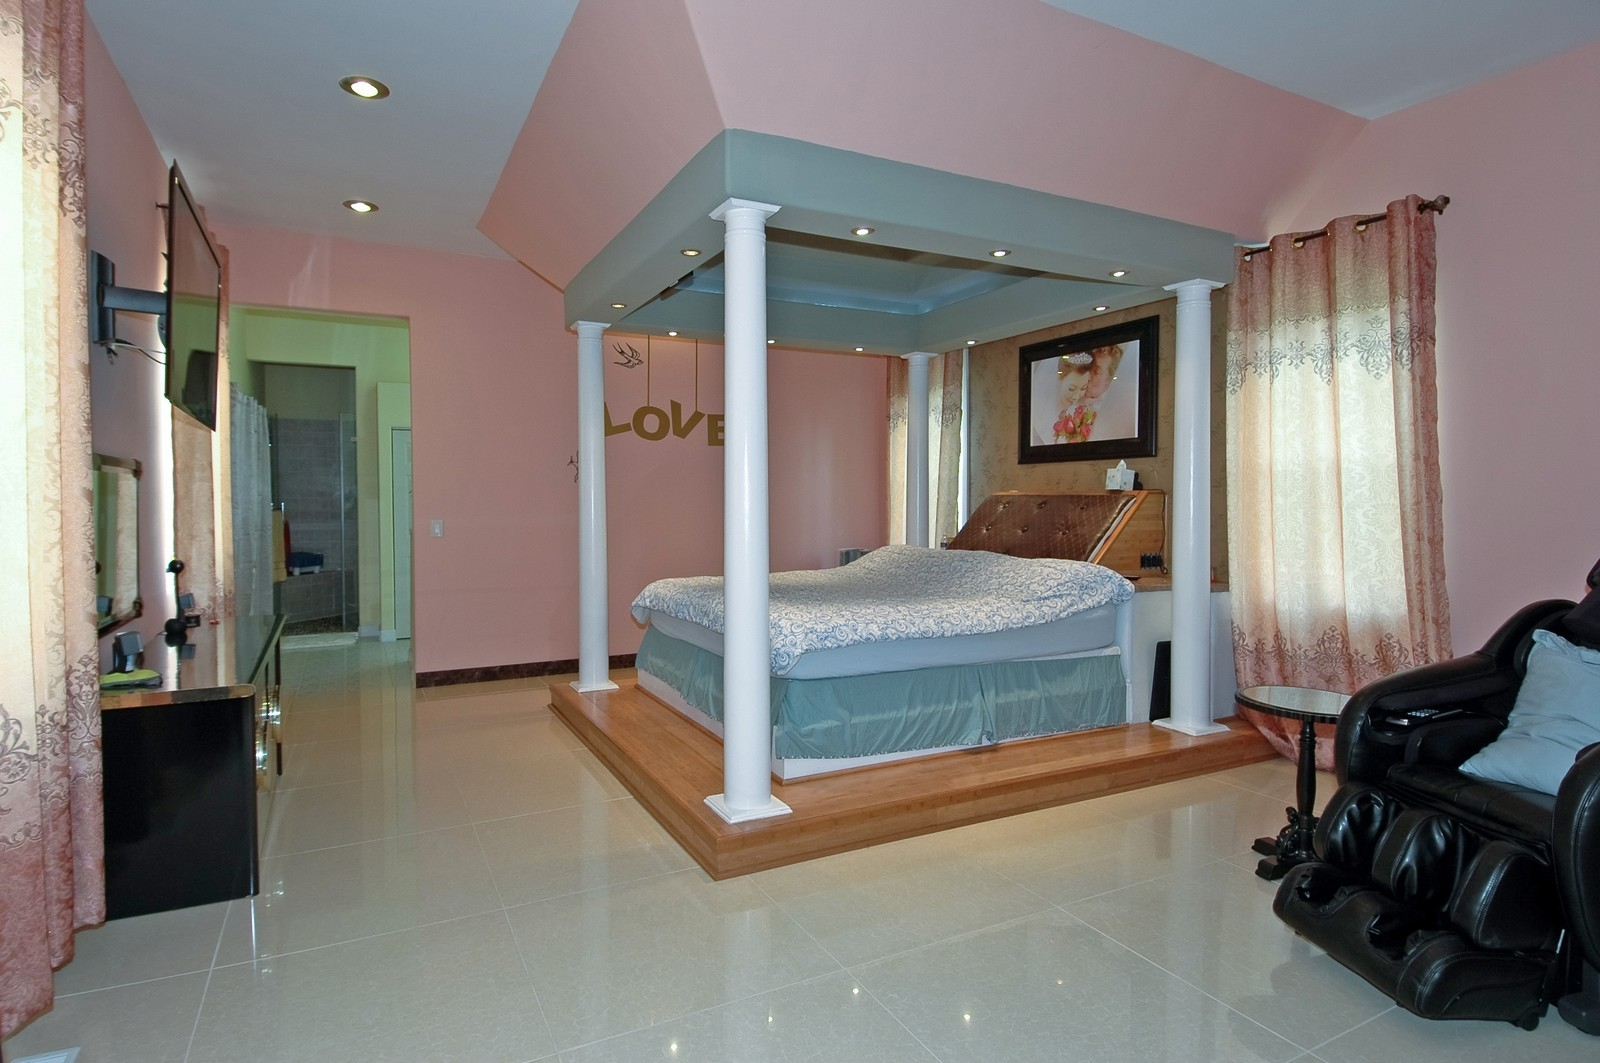 Real Estate Photography - 10N875 Belmont St, Elgin, IL, 60120 - Master Bedroom